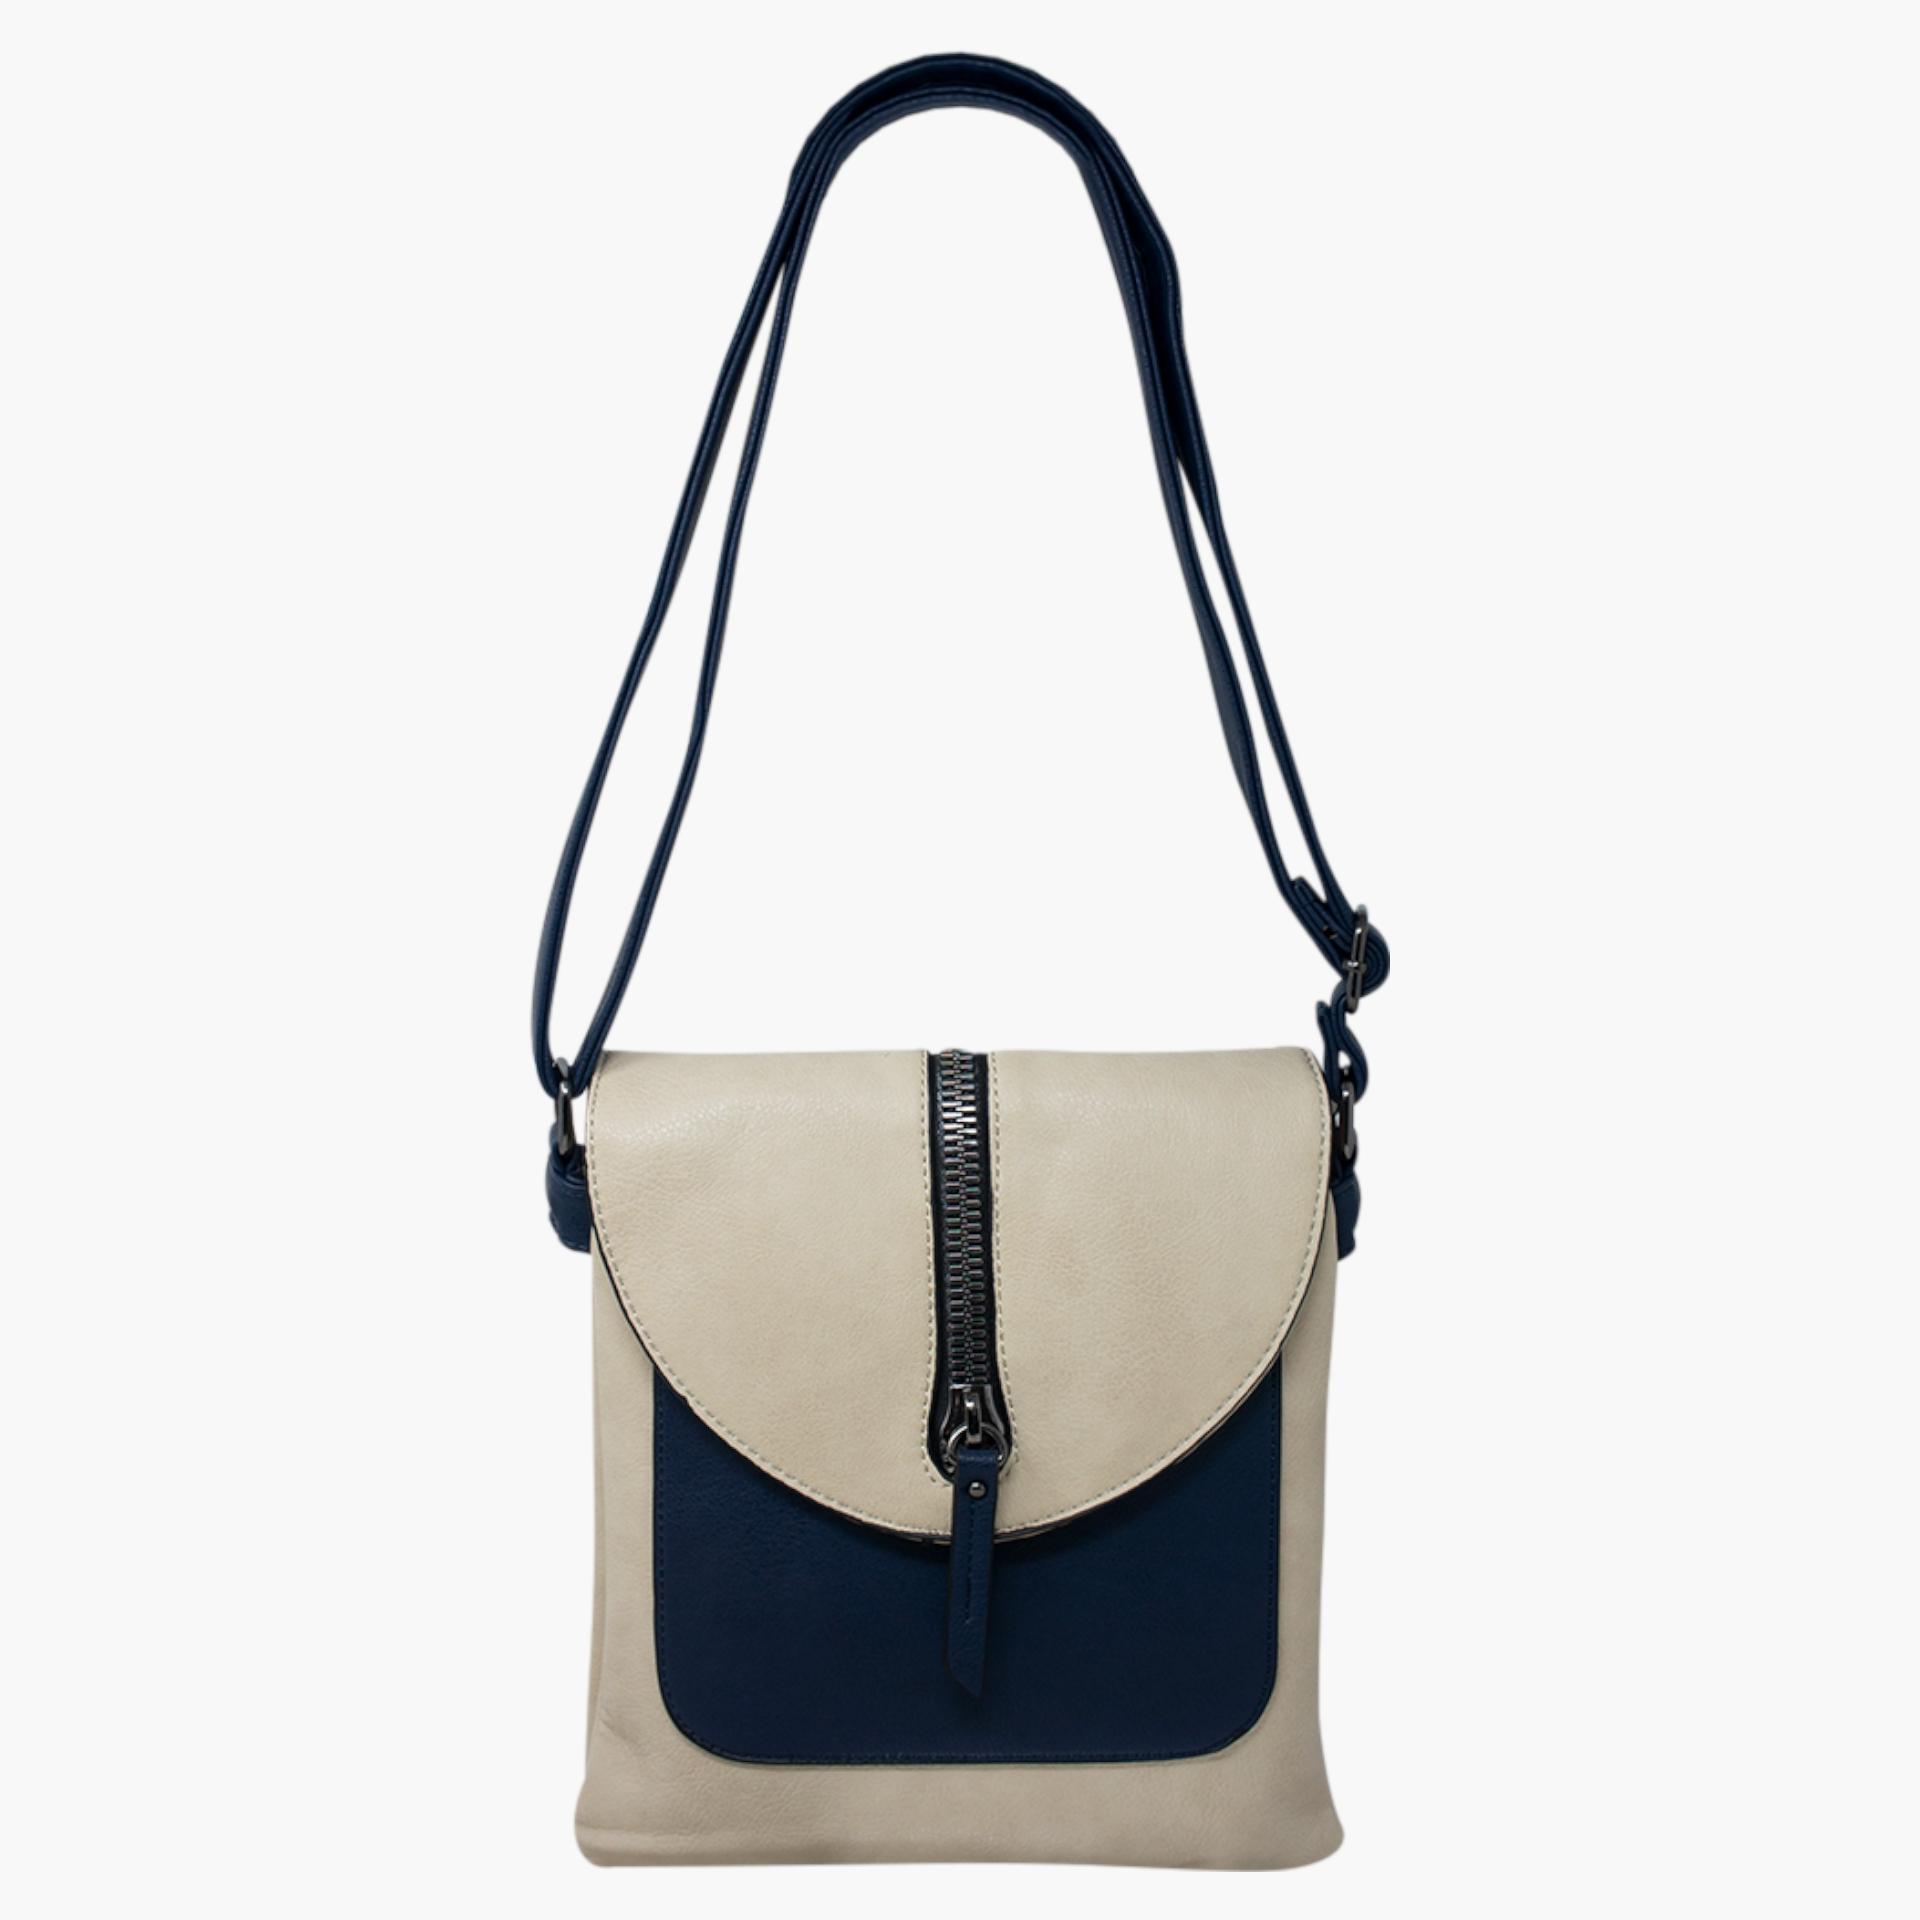 Cross Body Bag with Zip Detail  - Cream/Navy Blue